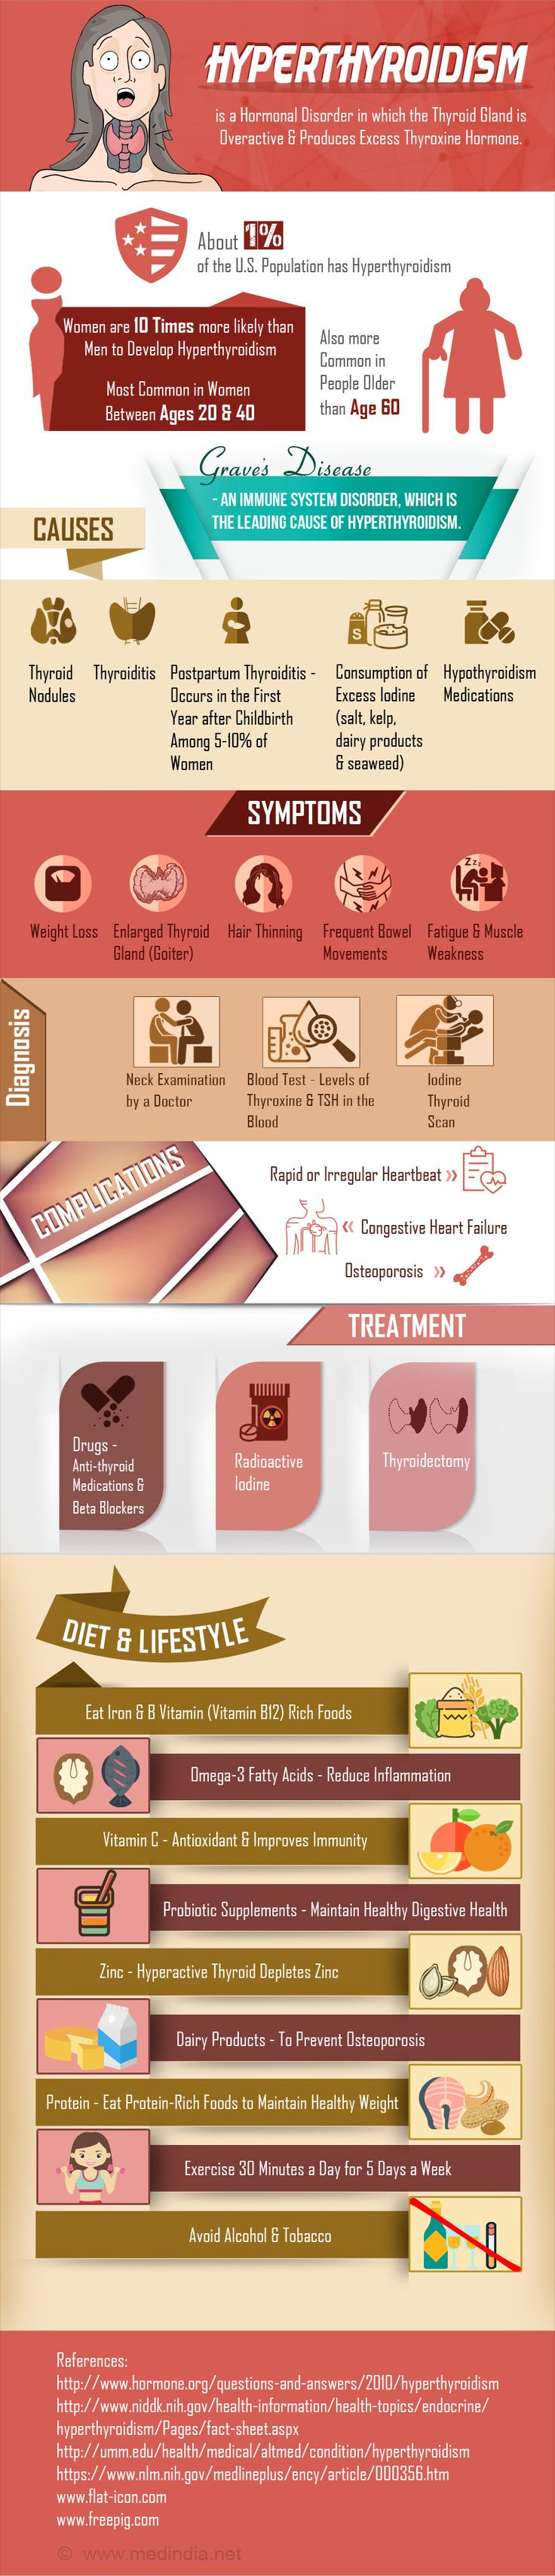 Infographic on Hyperthyroidism